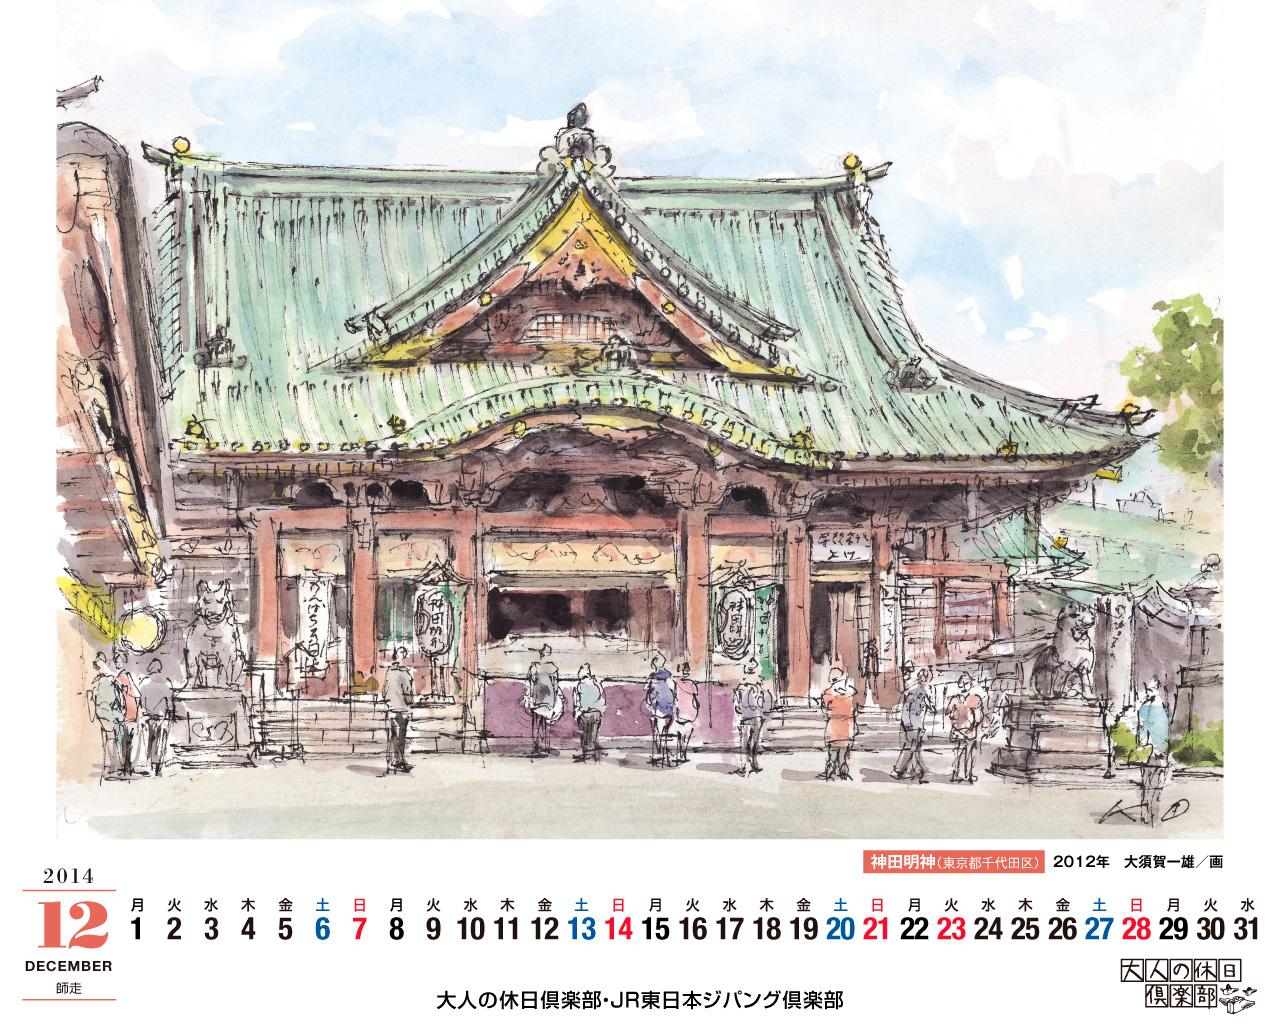 Advent Calendar Template For Ks2 | Calendar Template 2016